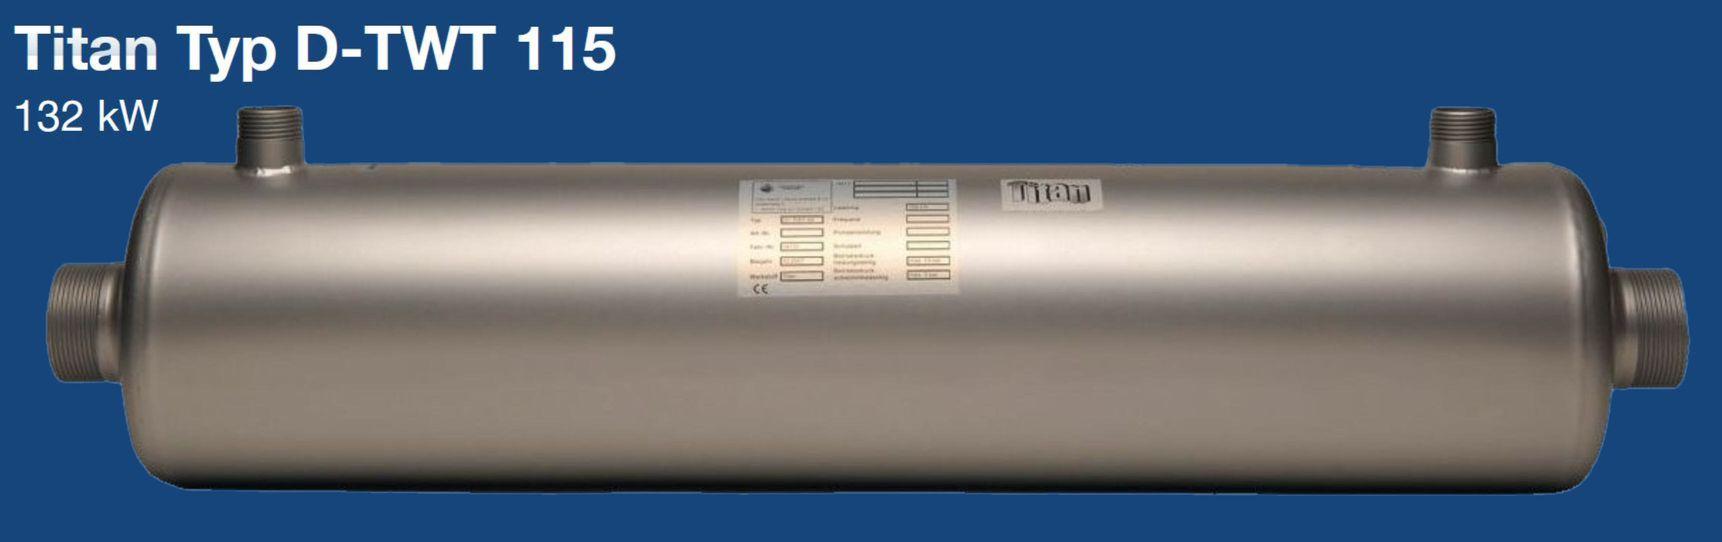 Daprà Titan Heizungs-Wärme-Tauscher D-TWT 115 kW Killus-Technik.de